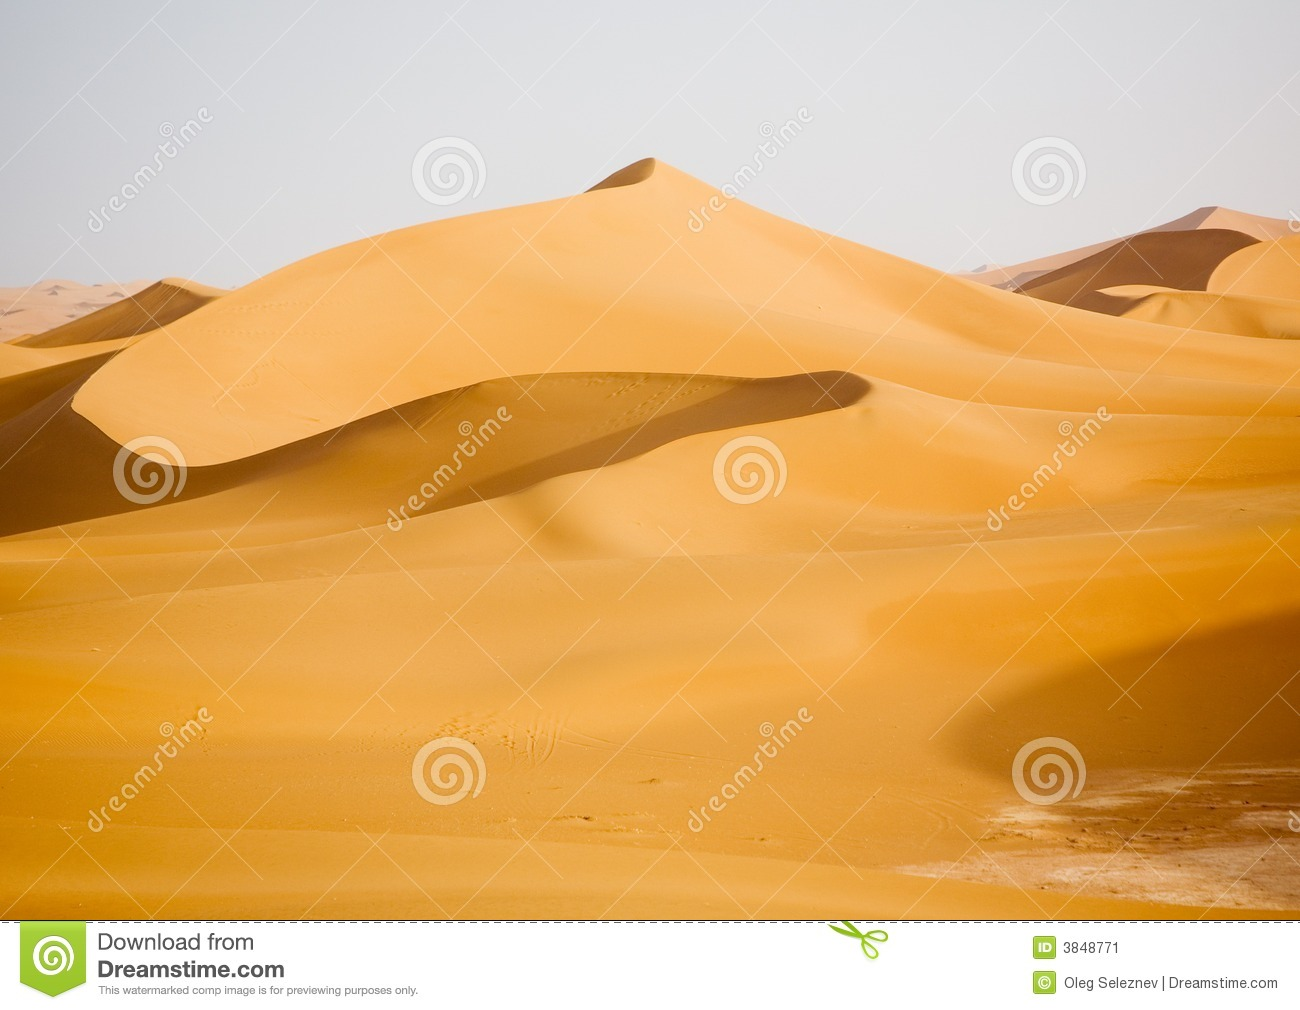 Sand Dune Clipart.